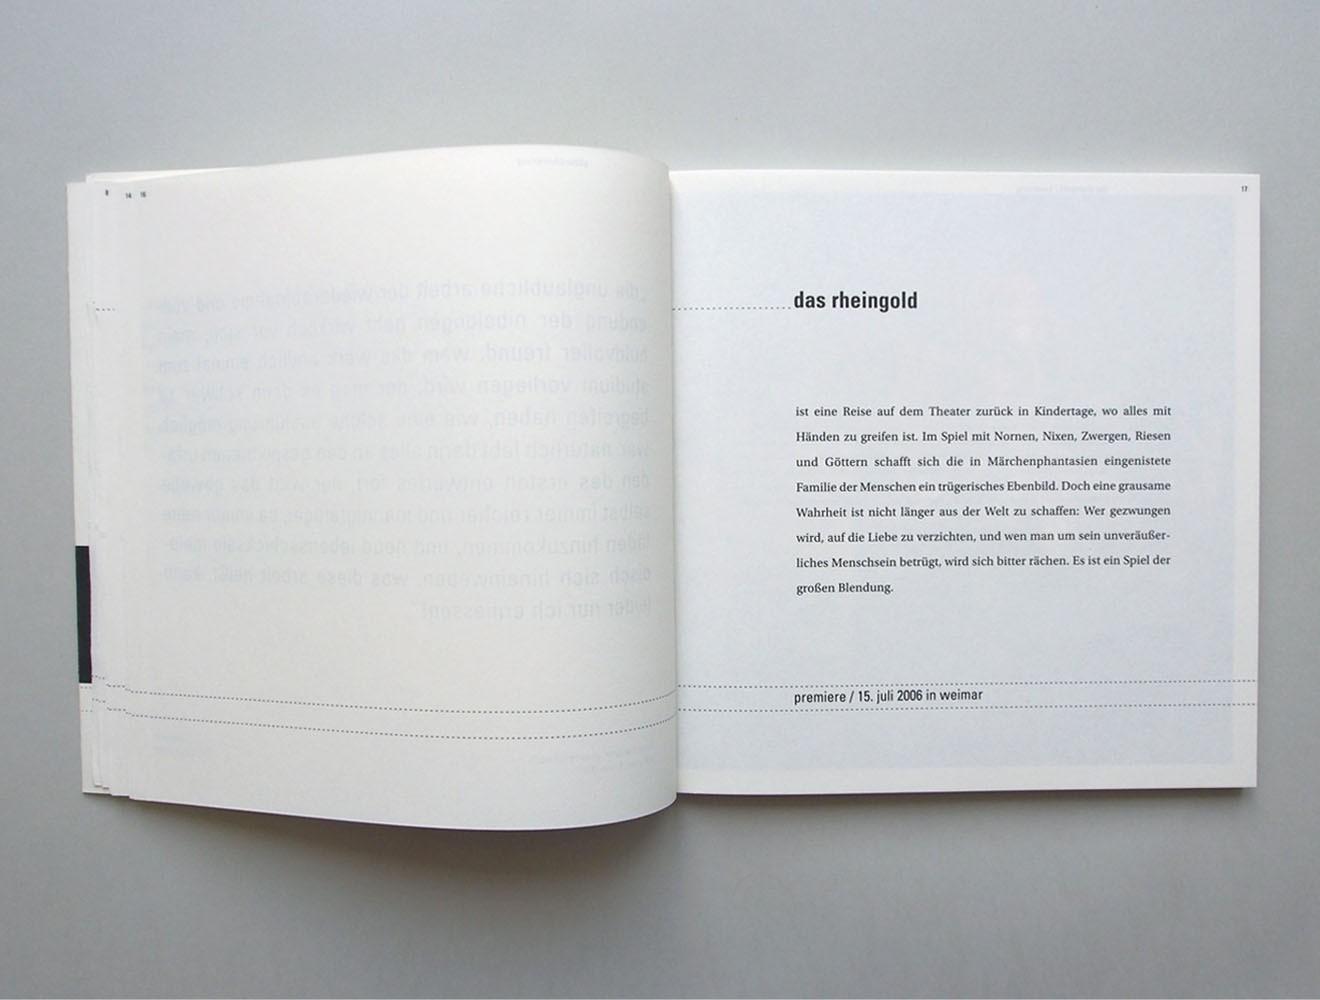 Ring // Dokumentation / Innenseite